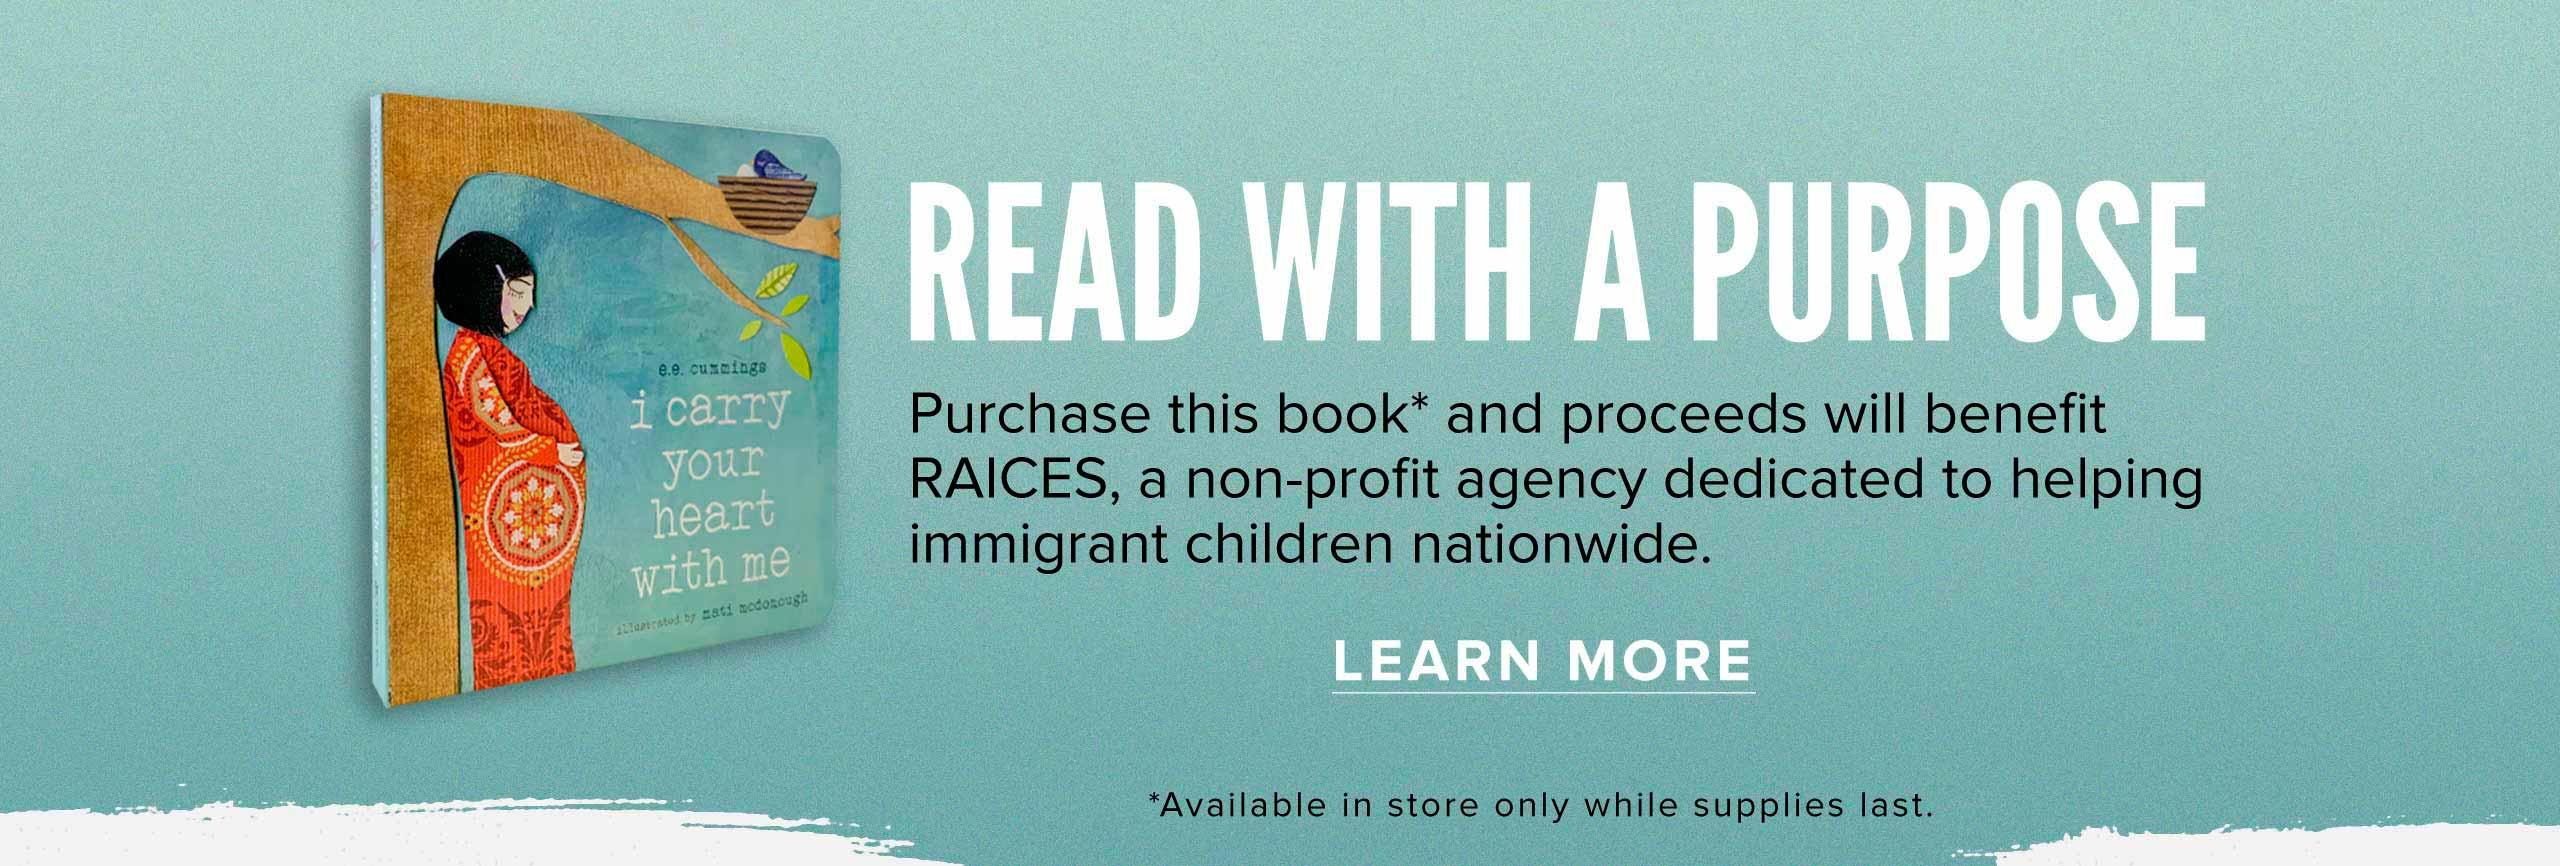 New & Used Books, Textbooks, Music & Movies | Half Price Books